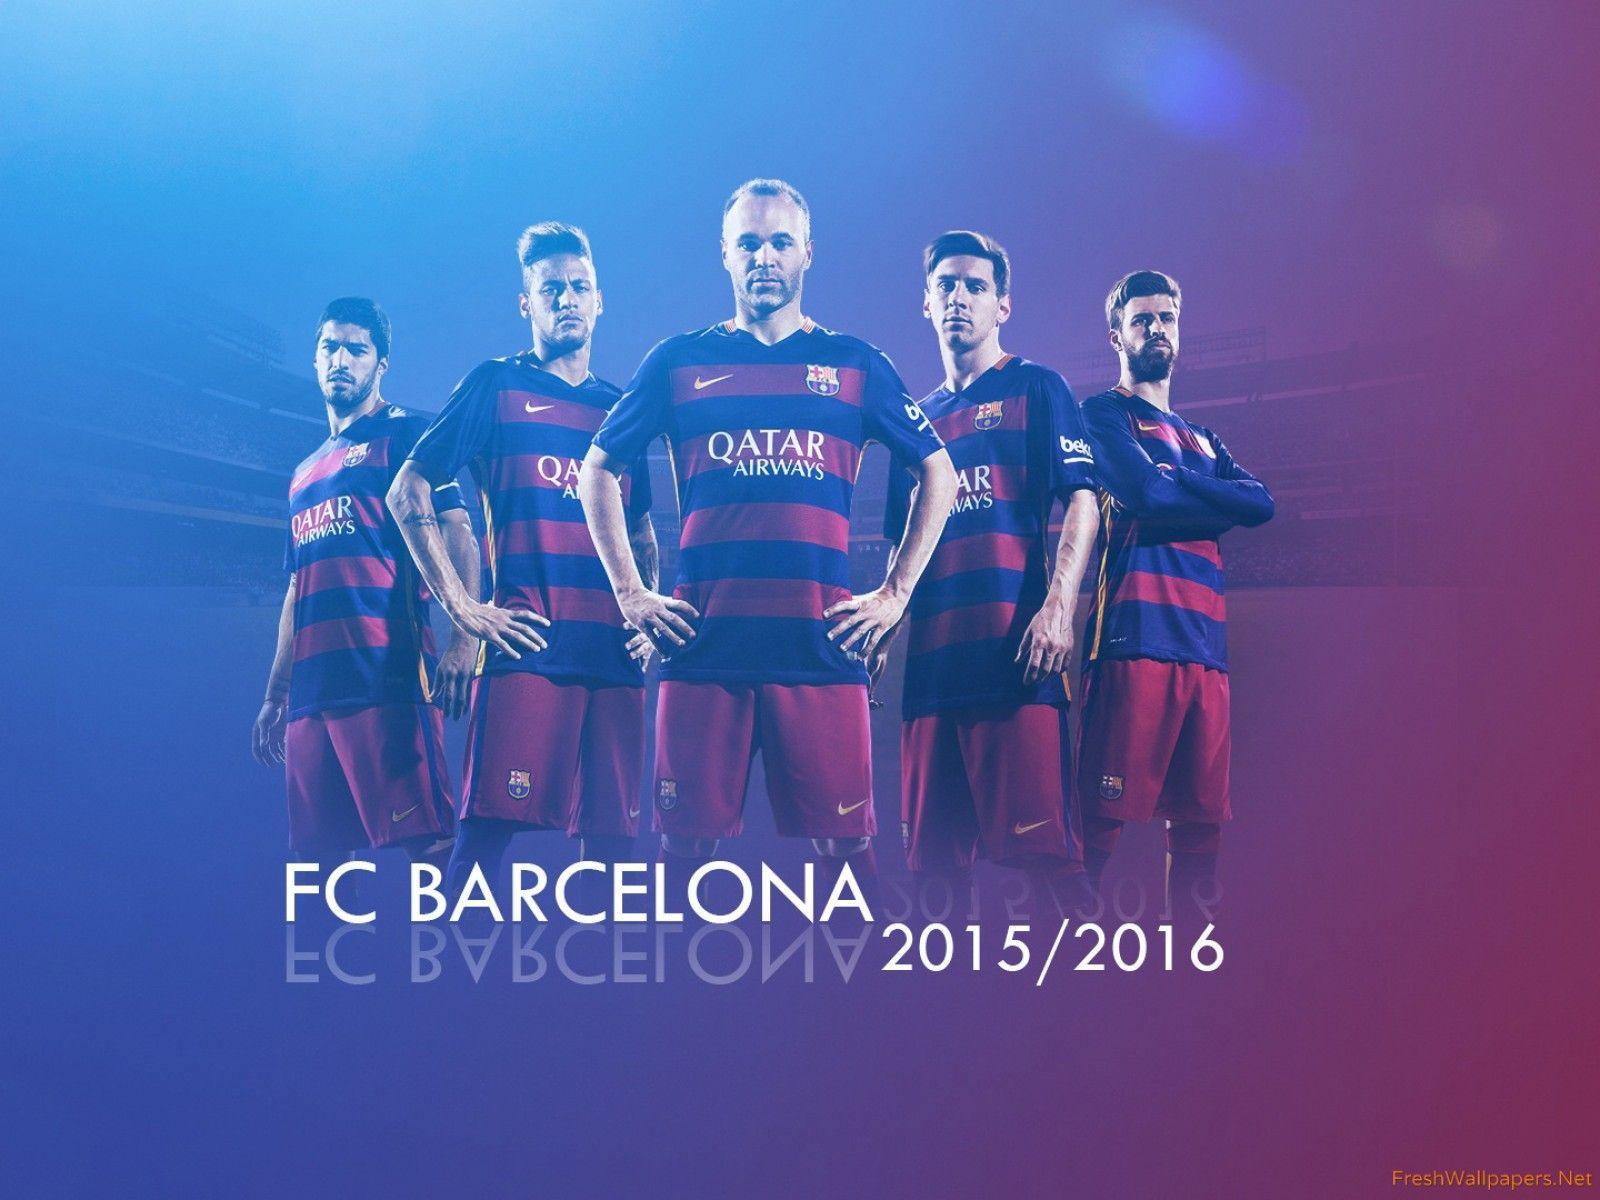 9058 - Dorsales del FC Barcelona